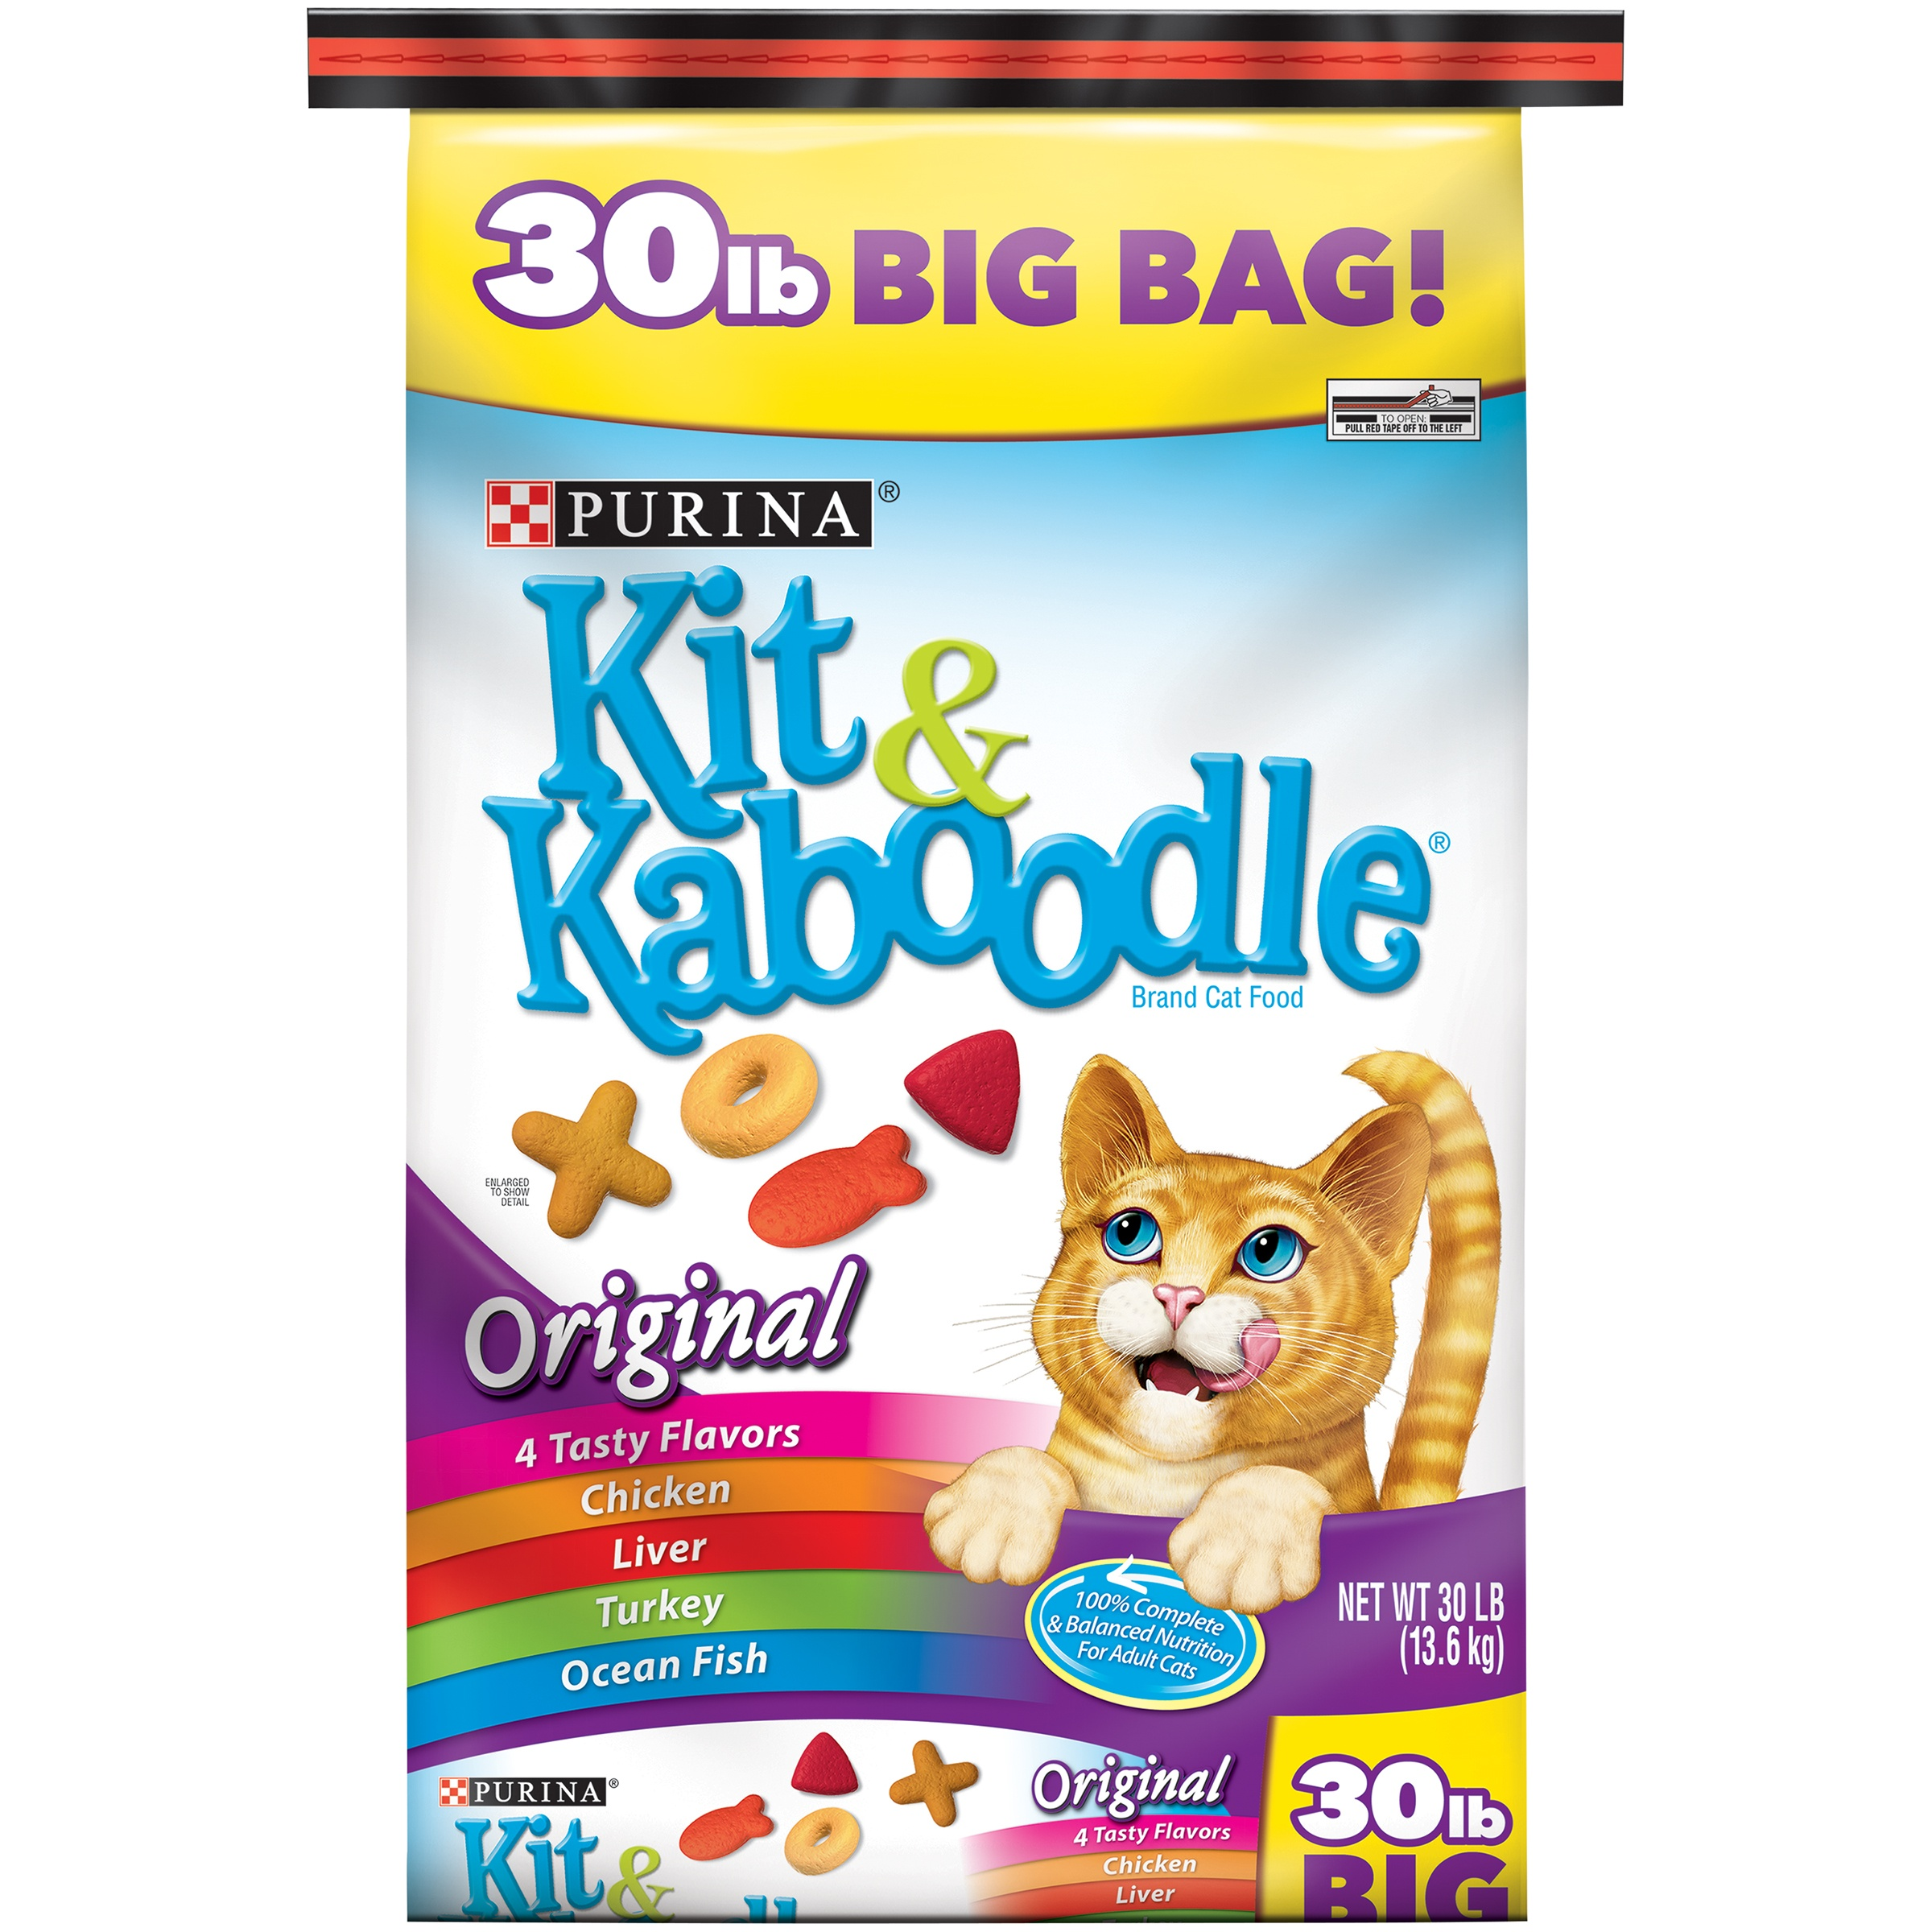 Purina Kit & Kaboodle Original Adult Dry Cat Food, 30 lb - Walmart.com